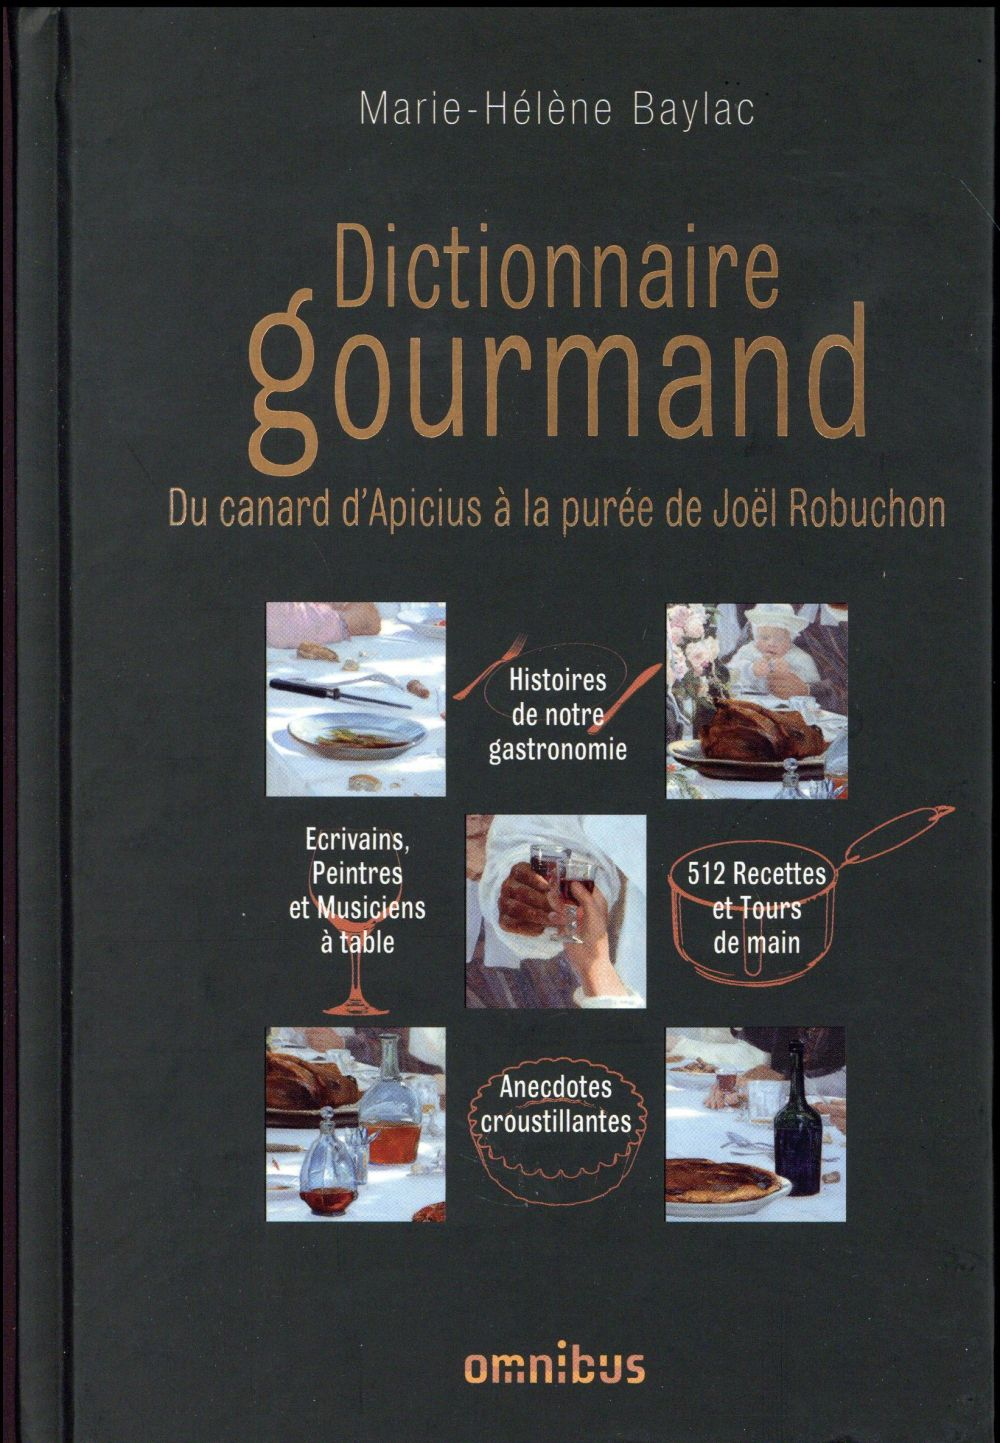 DICTIONNAIRE GOURMAND DU CANAR BAYLAC MARIE-HELENE OMNIBUS